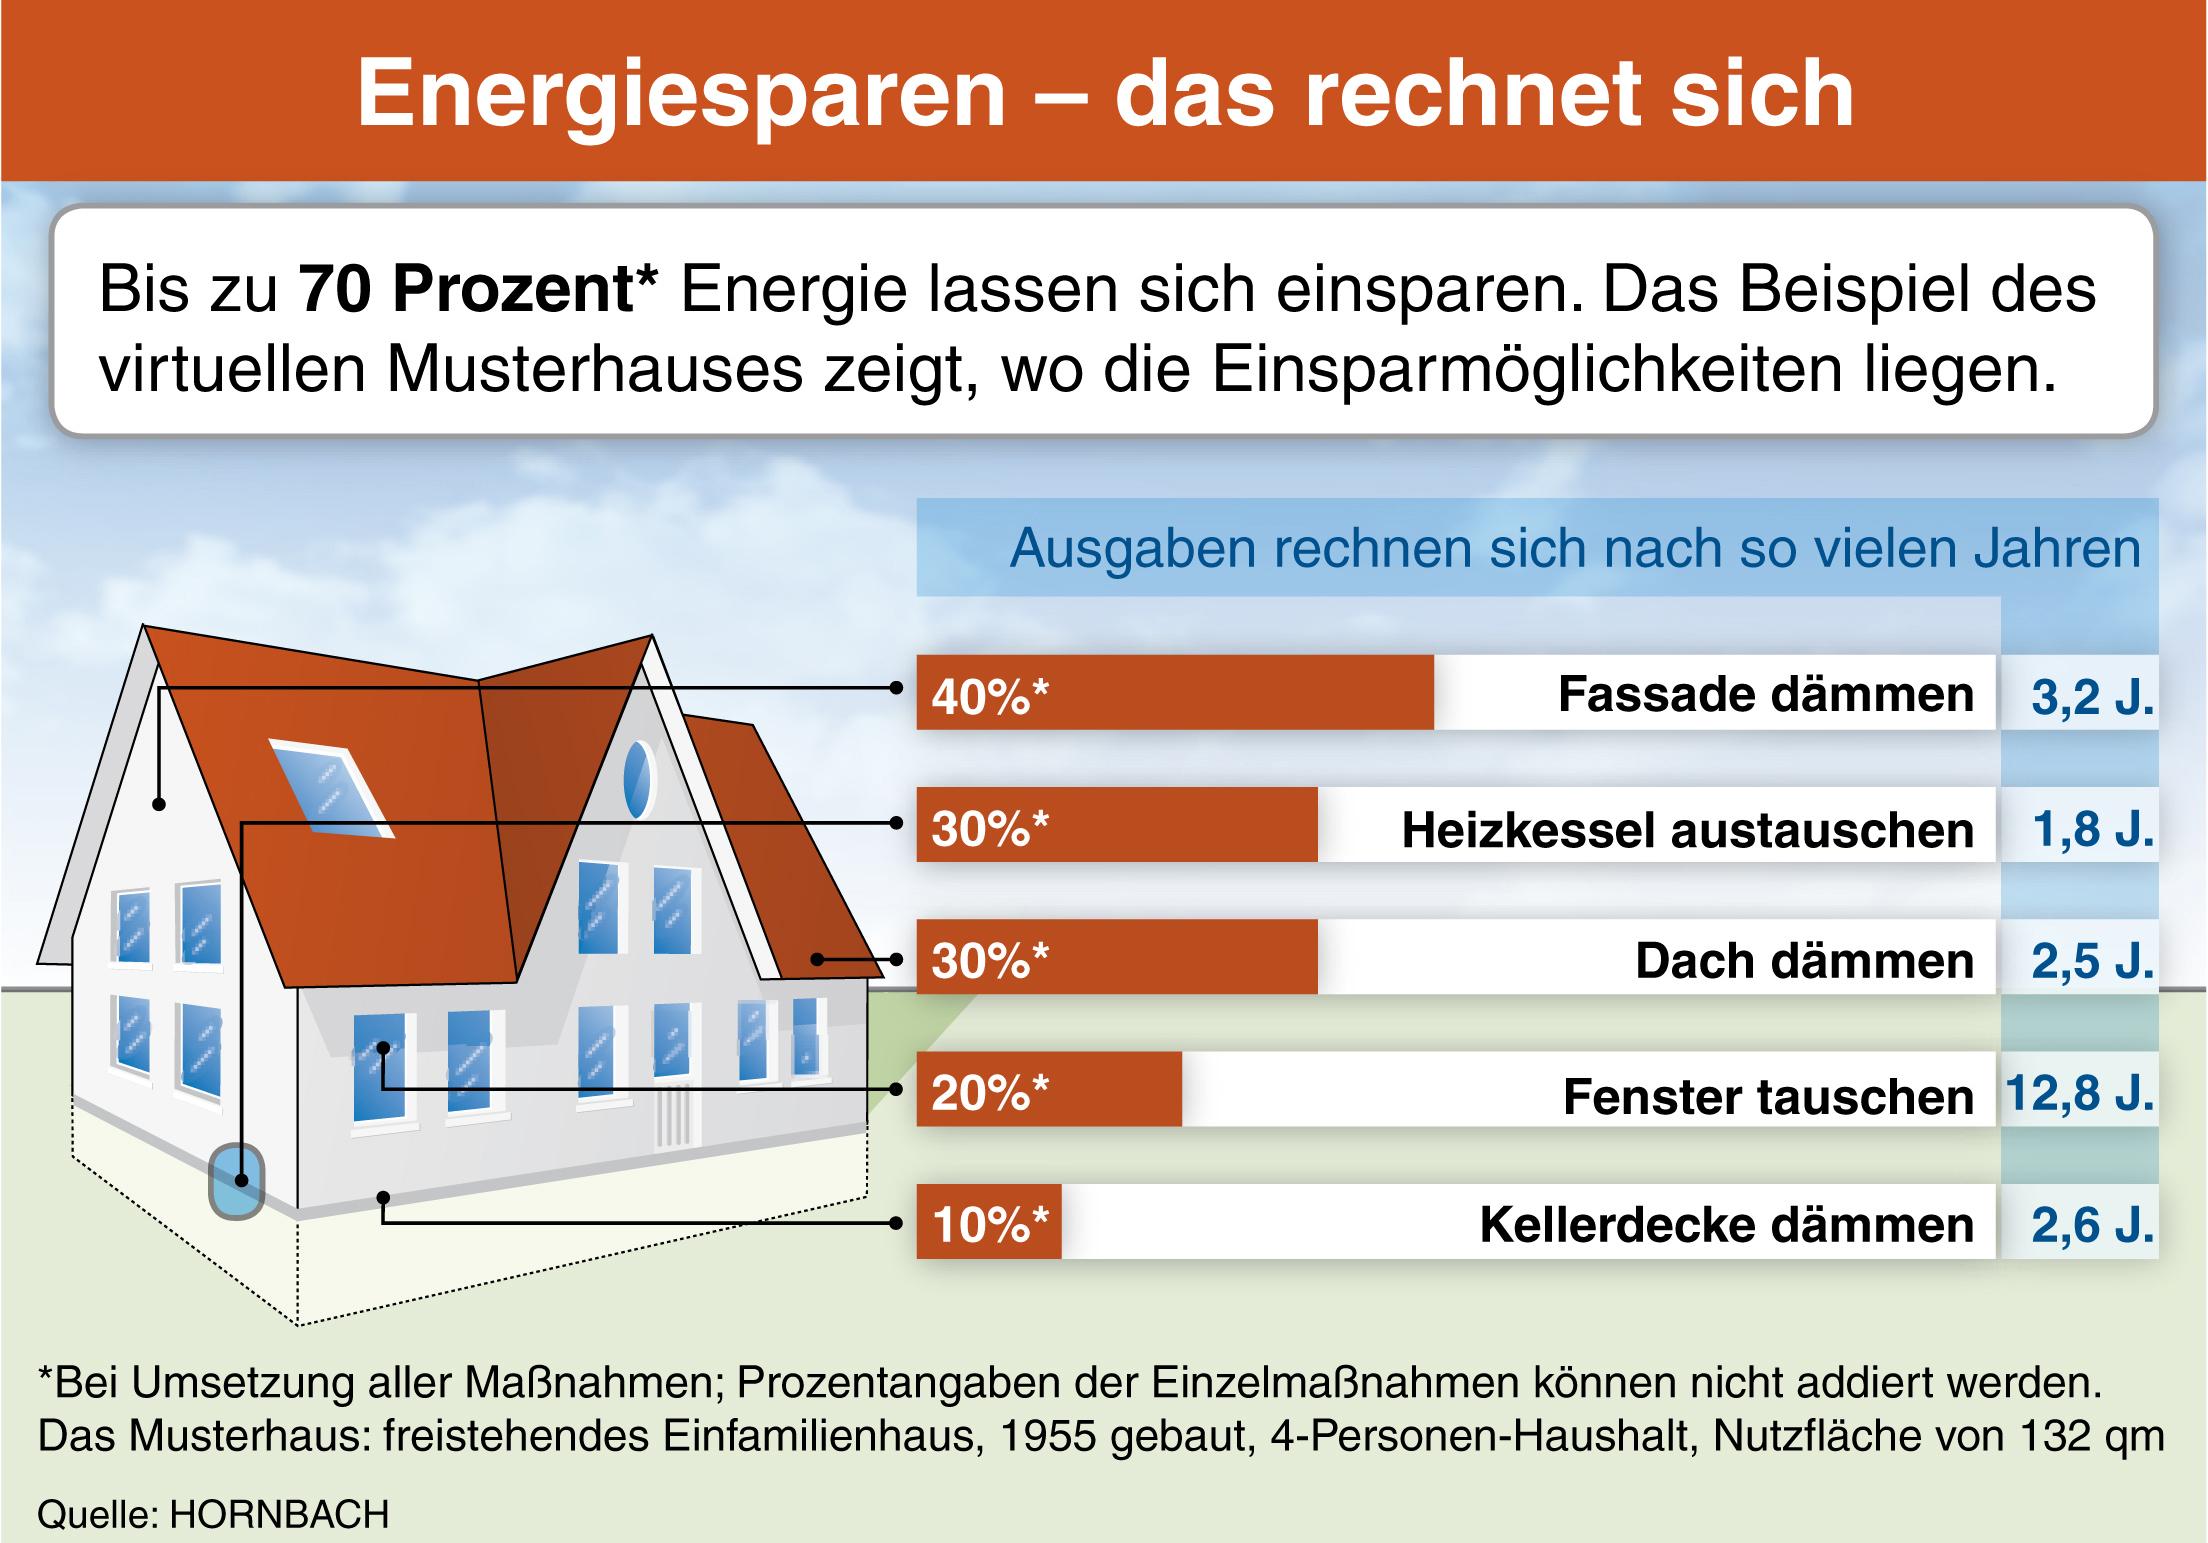 energiesparen das rechnet sich pressemitteilung hornbach baumarkt ag. Black Bedroom Furniture Sets. Home Design Ideas